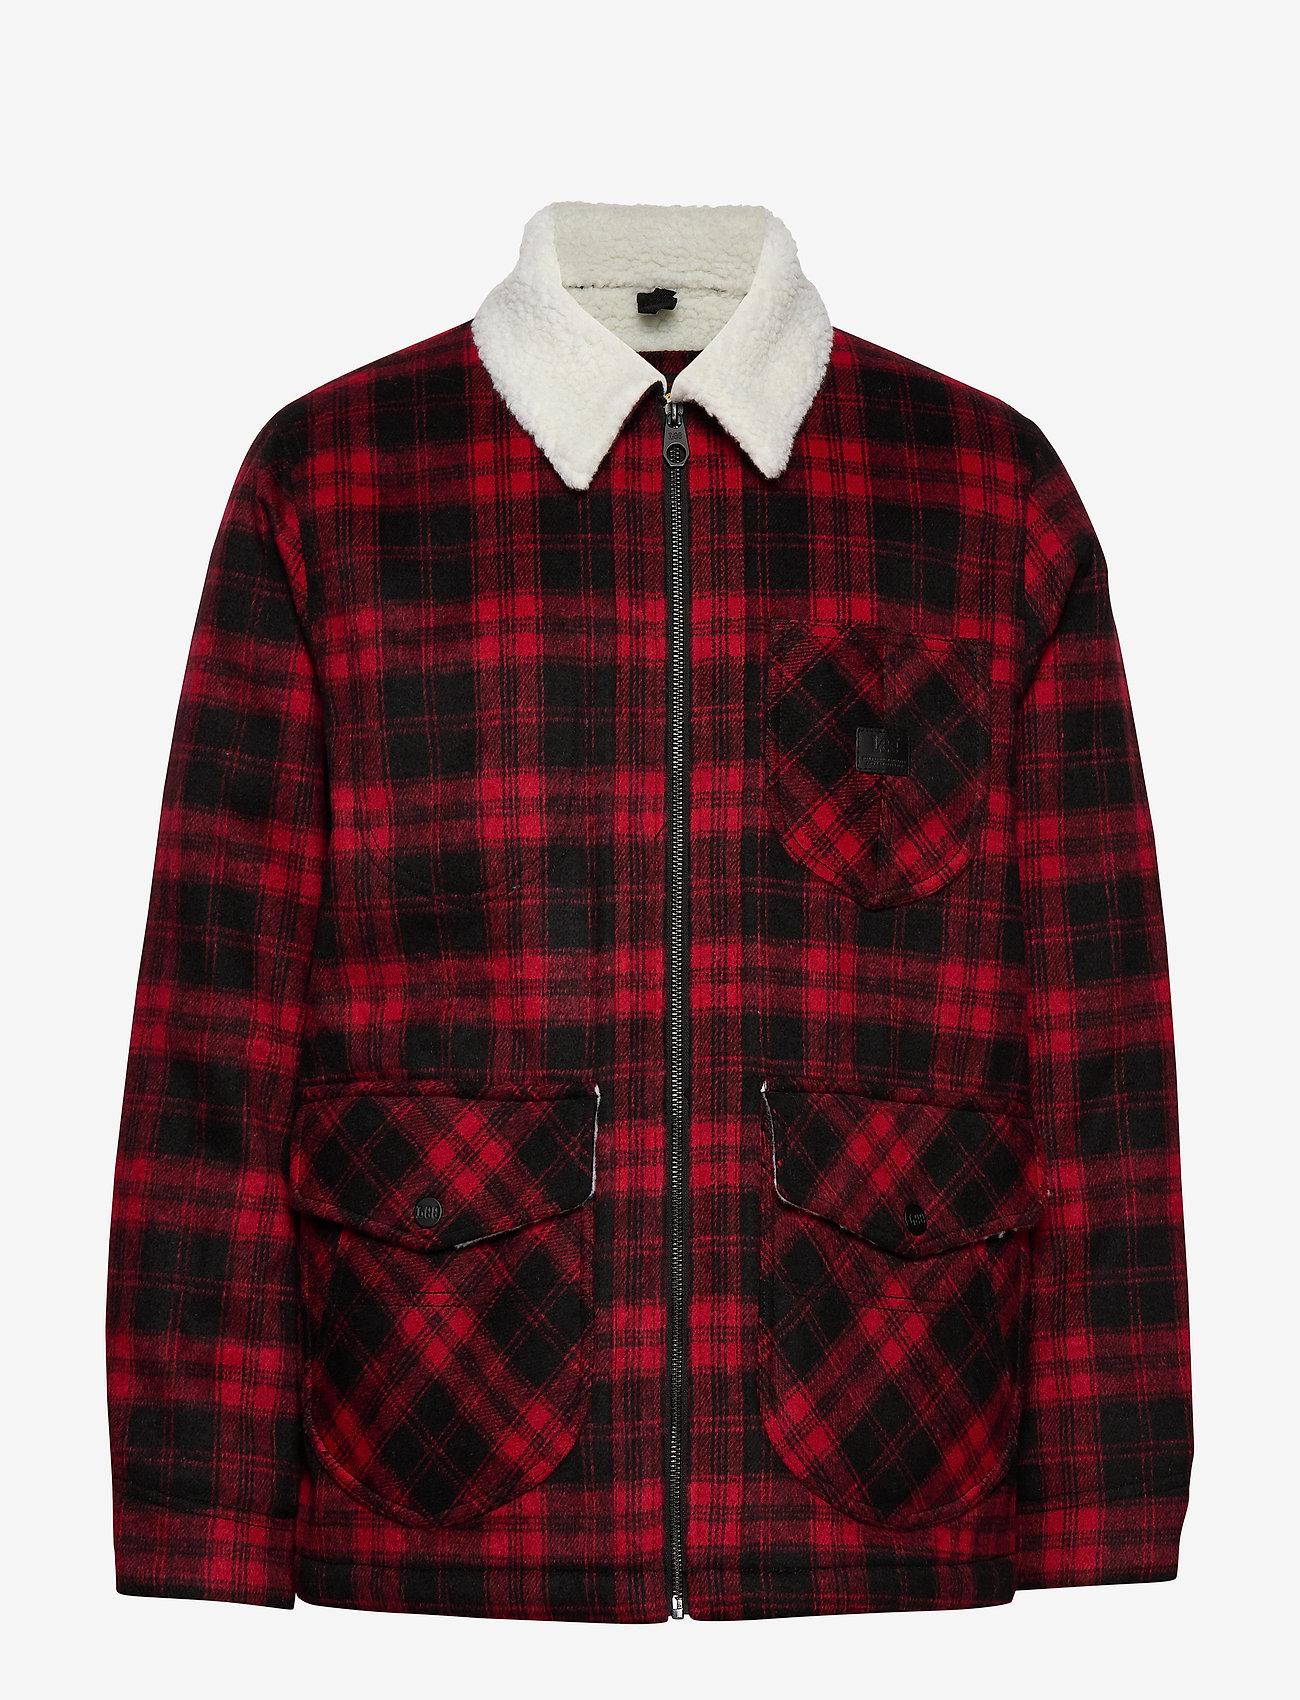 Lee Jeans - WOOL LOCO SHERPA - wool jackets - warp red - 0